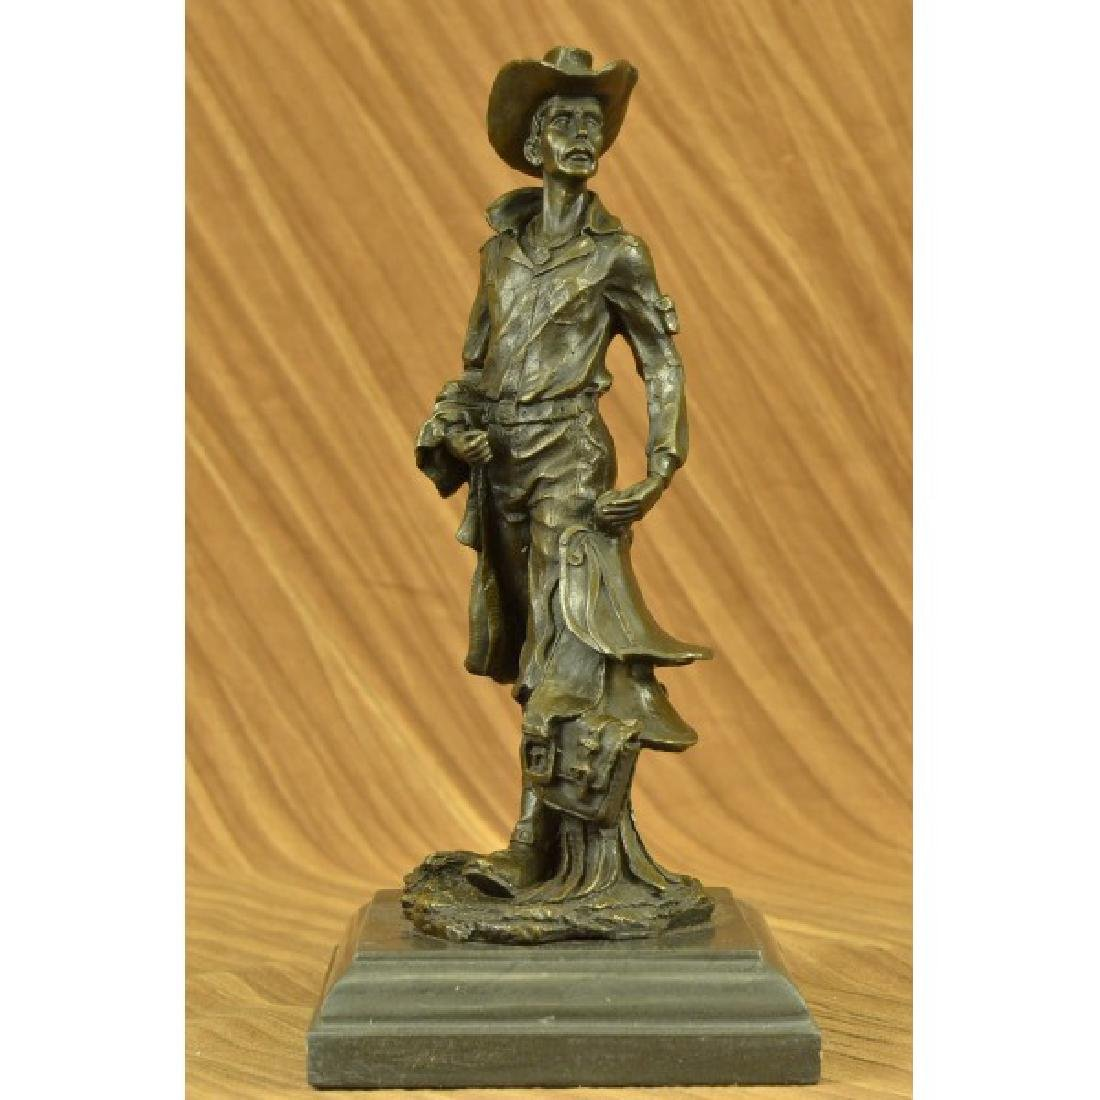 Kamiko Old Cowboy holding his Saddle Bronze Sculpture